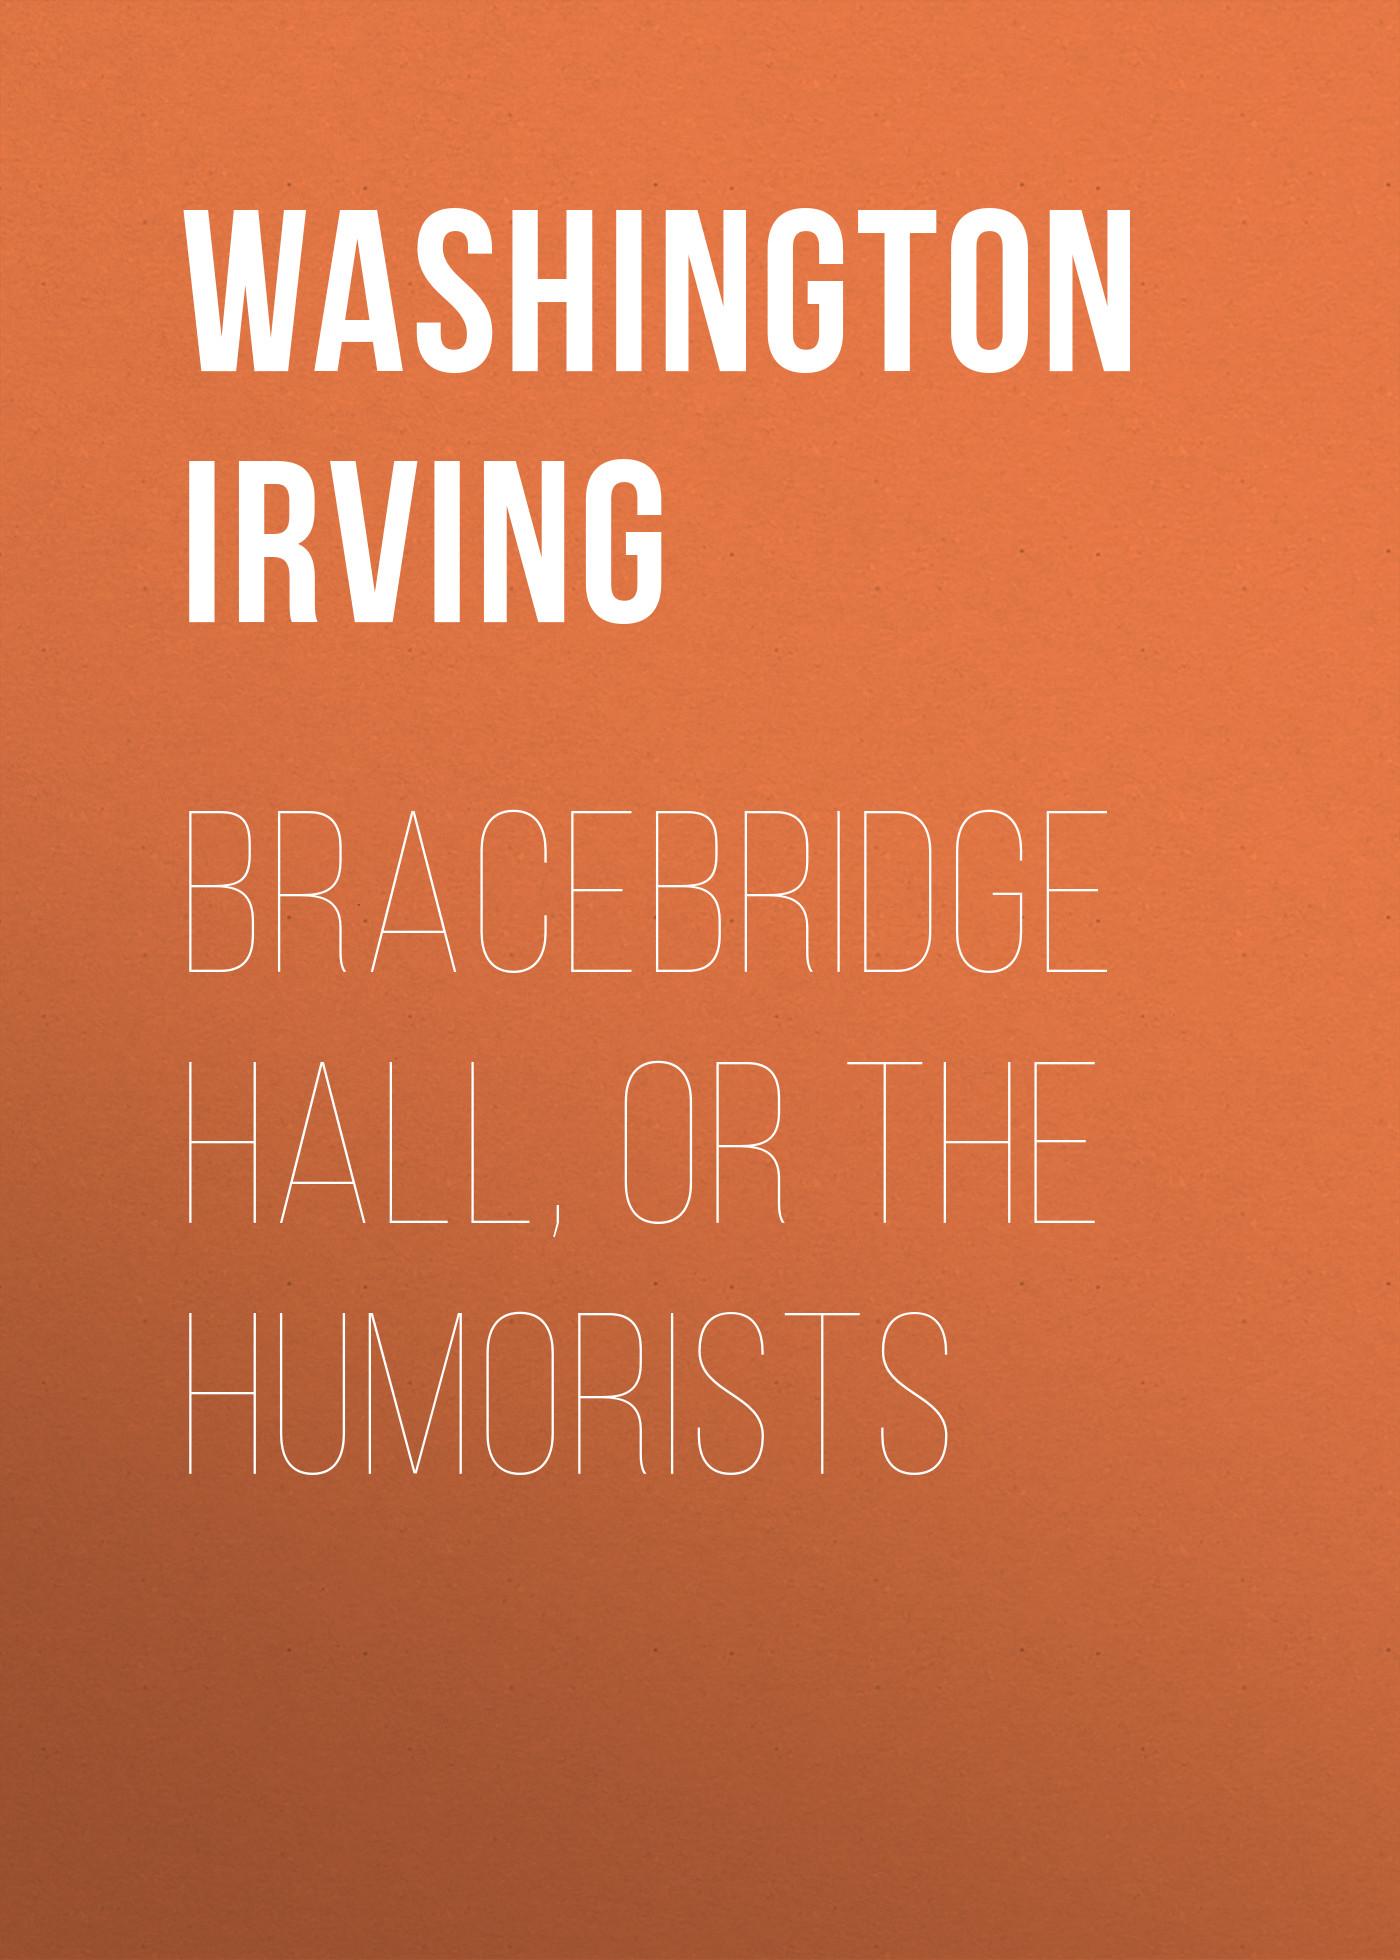 Вашингтон Ирвинг Bracebridge Hall, or The Humorists вашингтон ирвинг the crayon papers